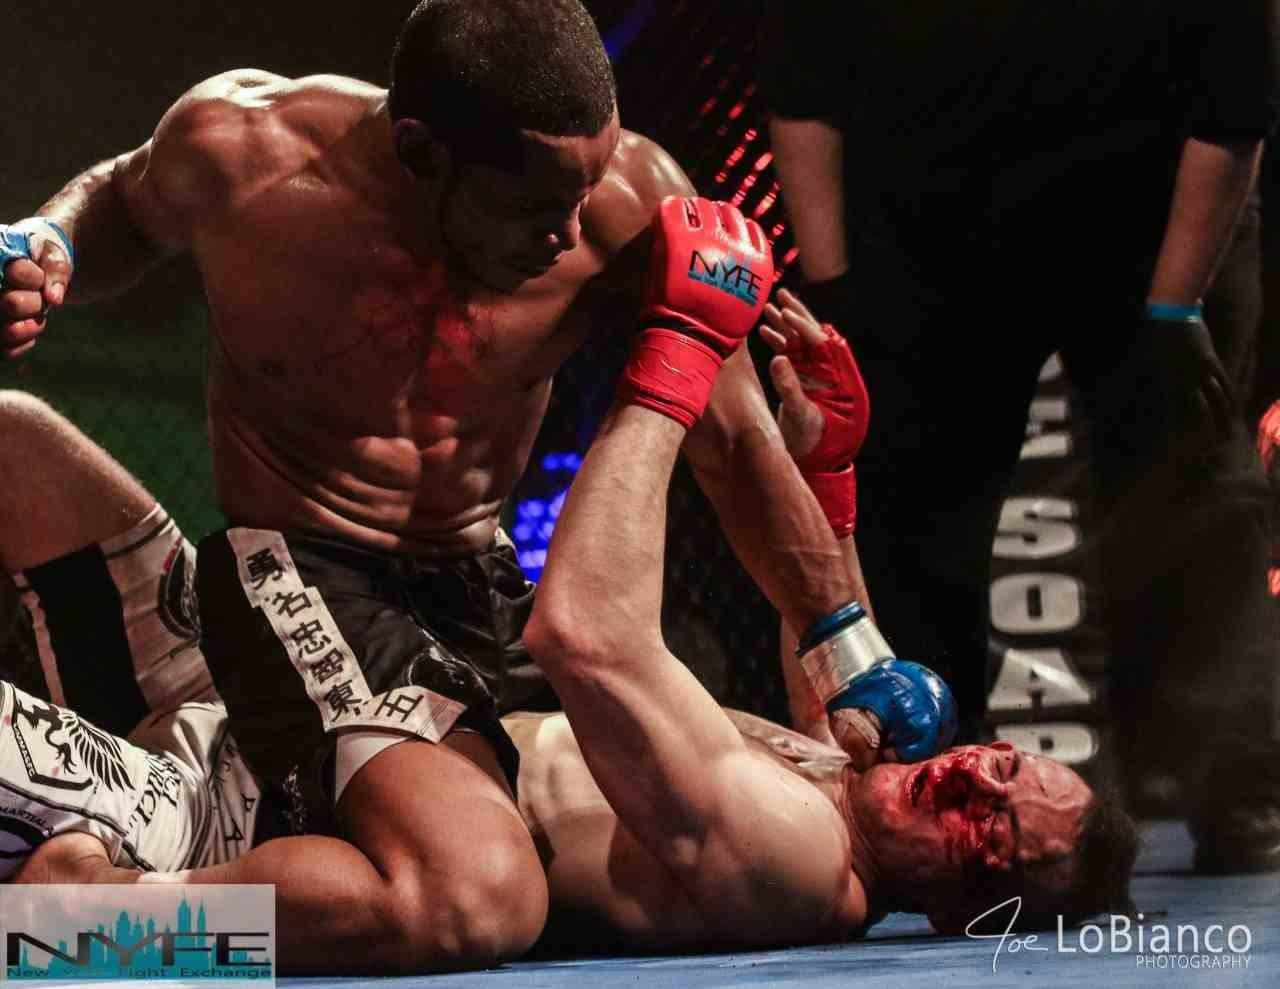 Najeeb Jones Brings Home the WKA MAA Belt- His THIRD Mixed Martial Arts Belt In NYC!